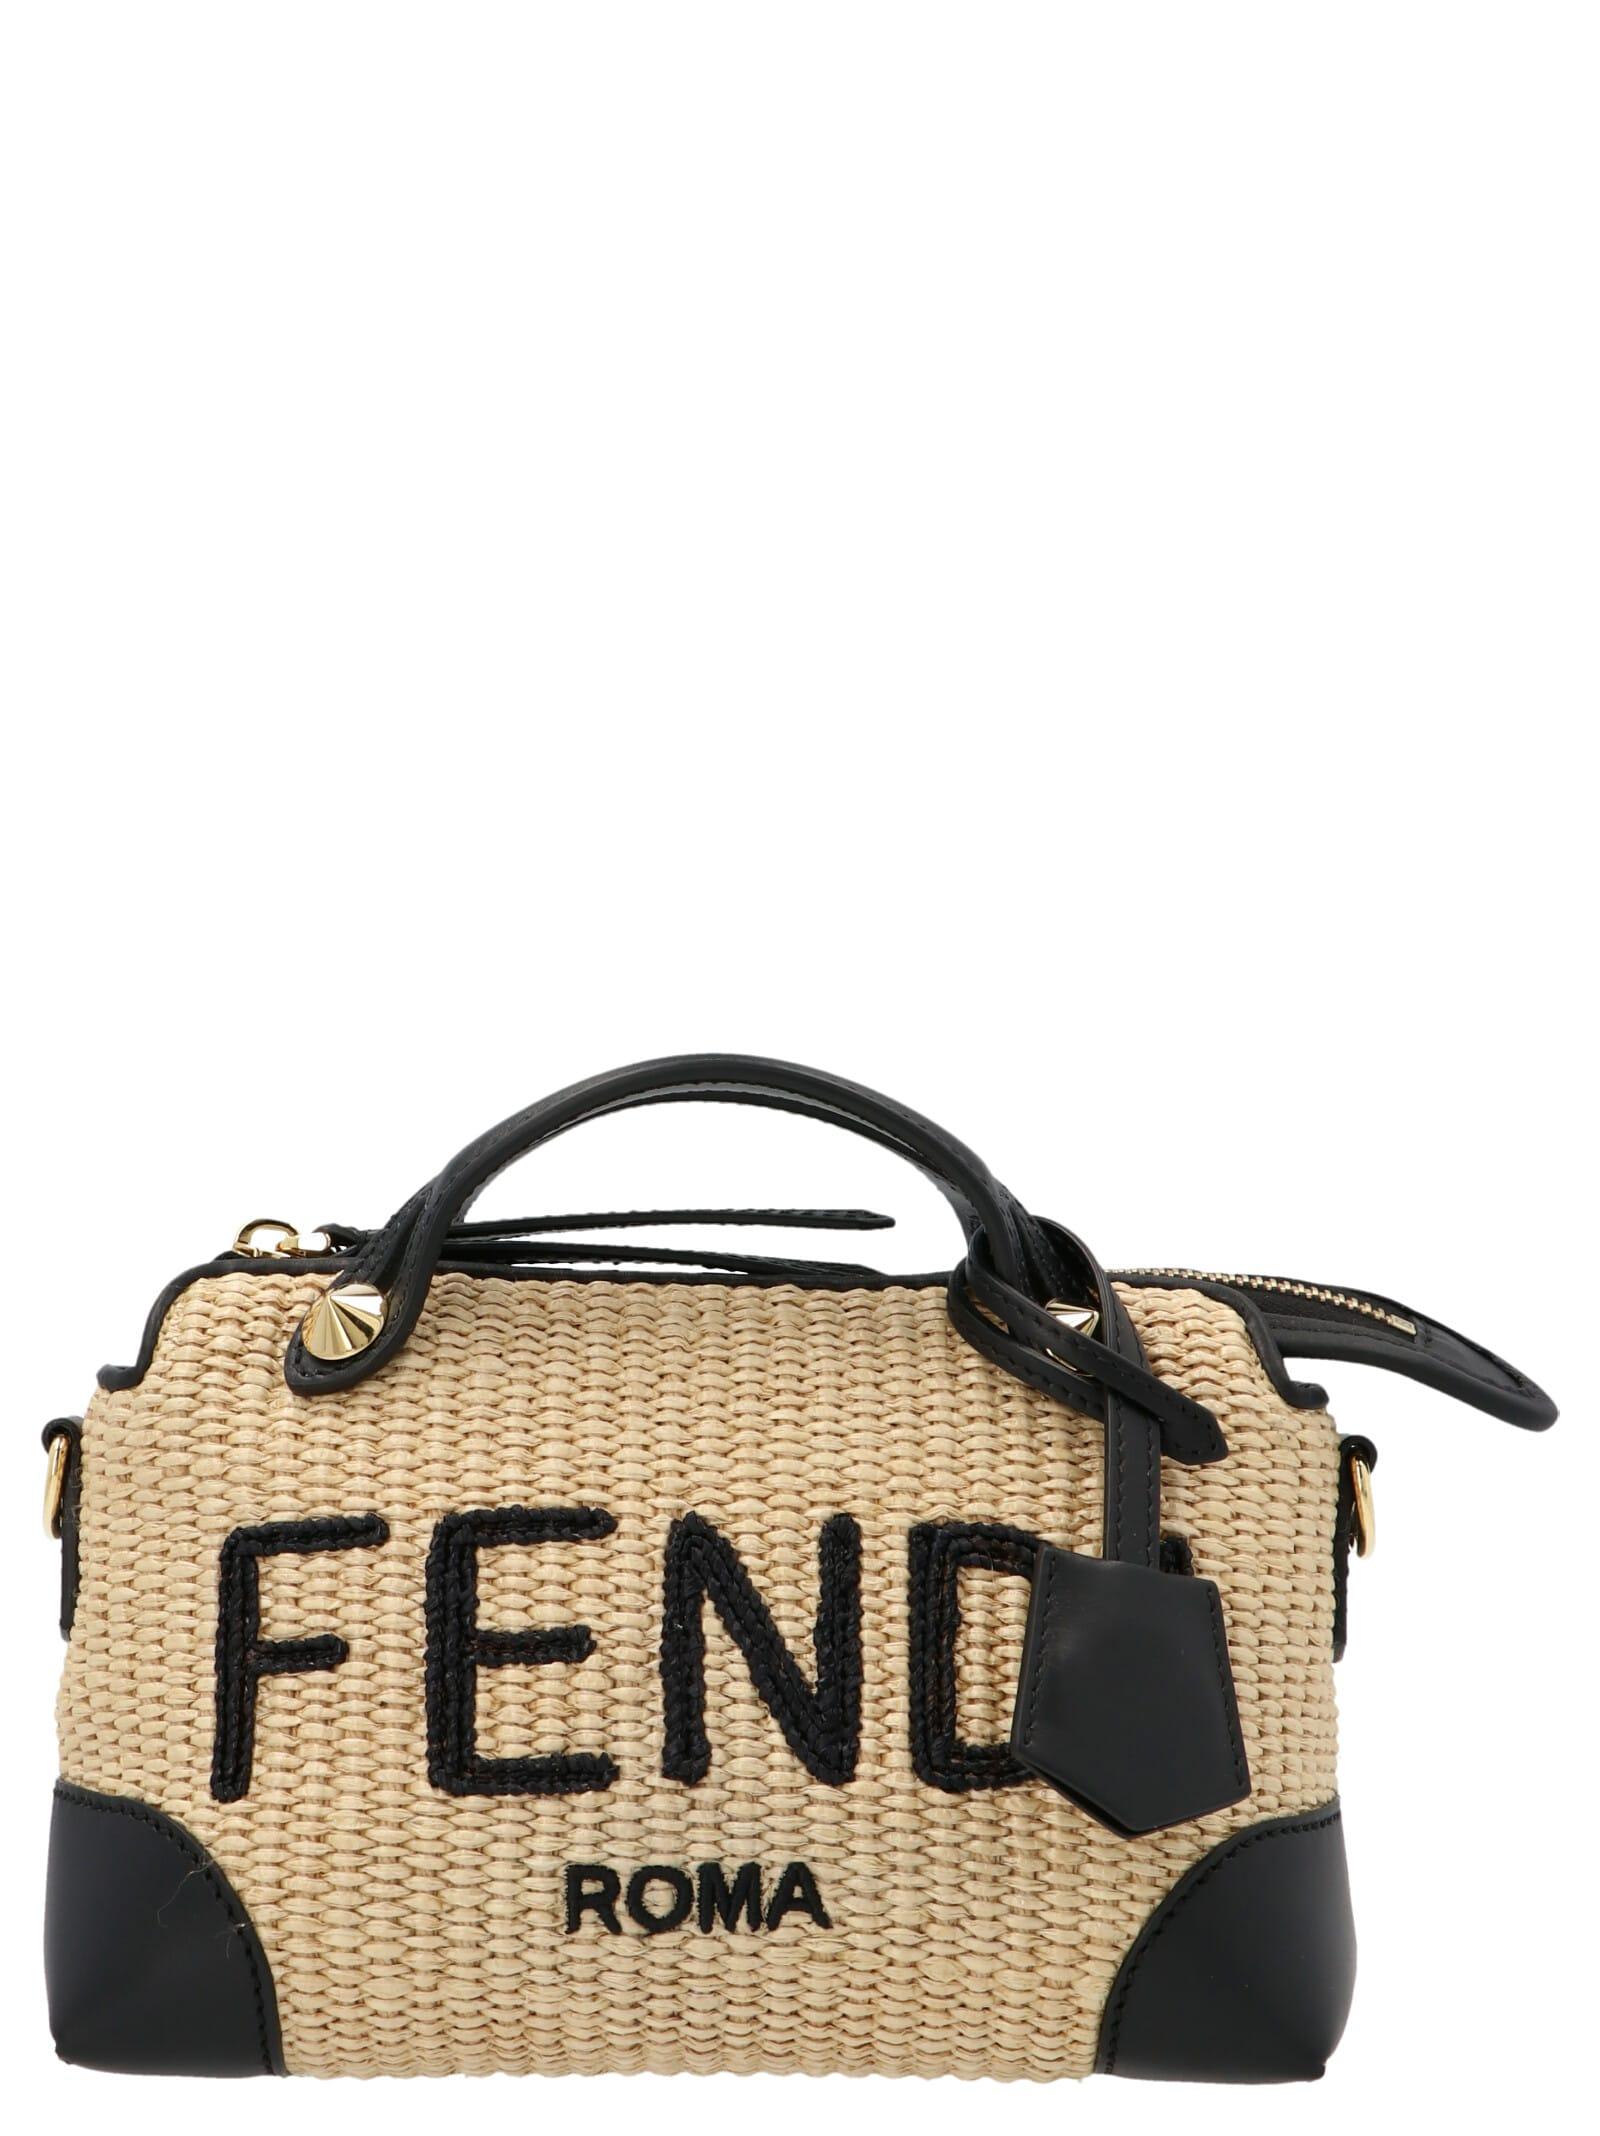 Fendi by The Way Mini Bag